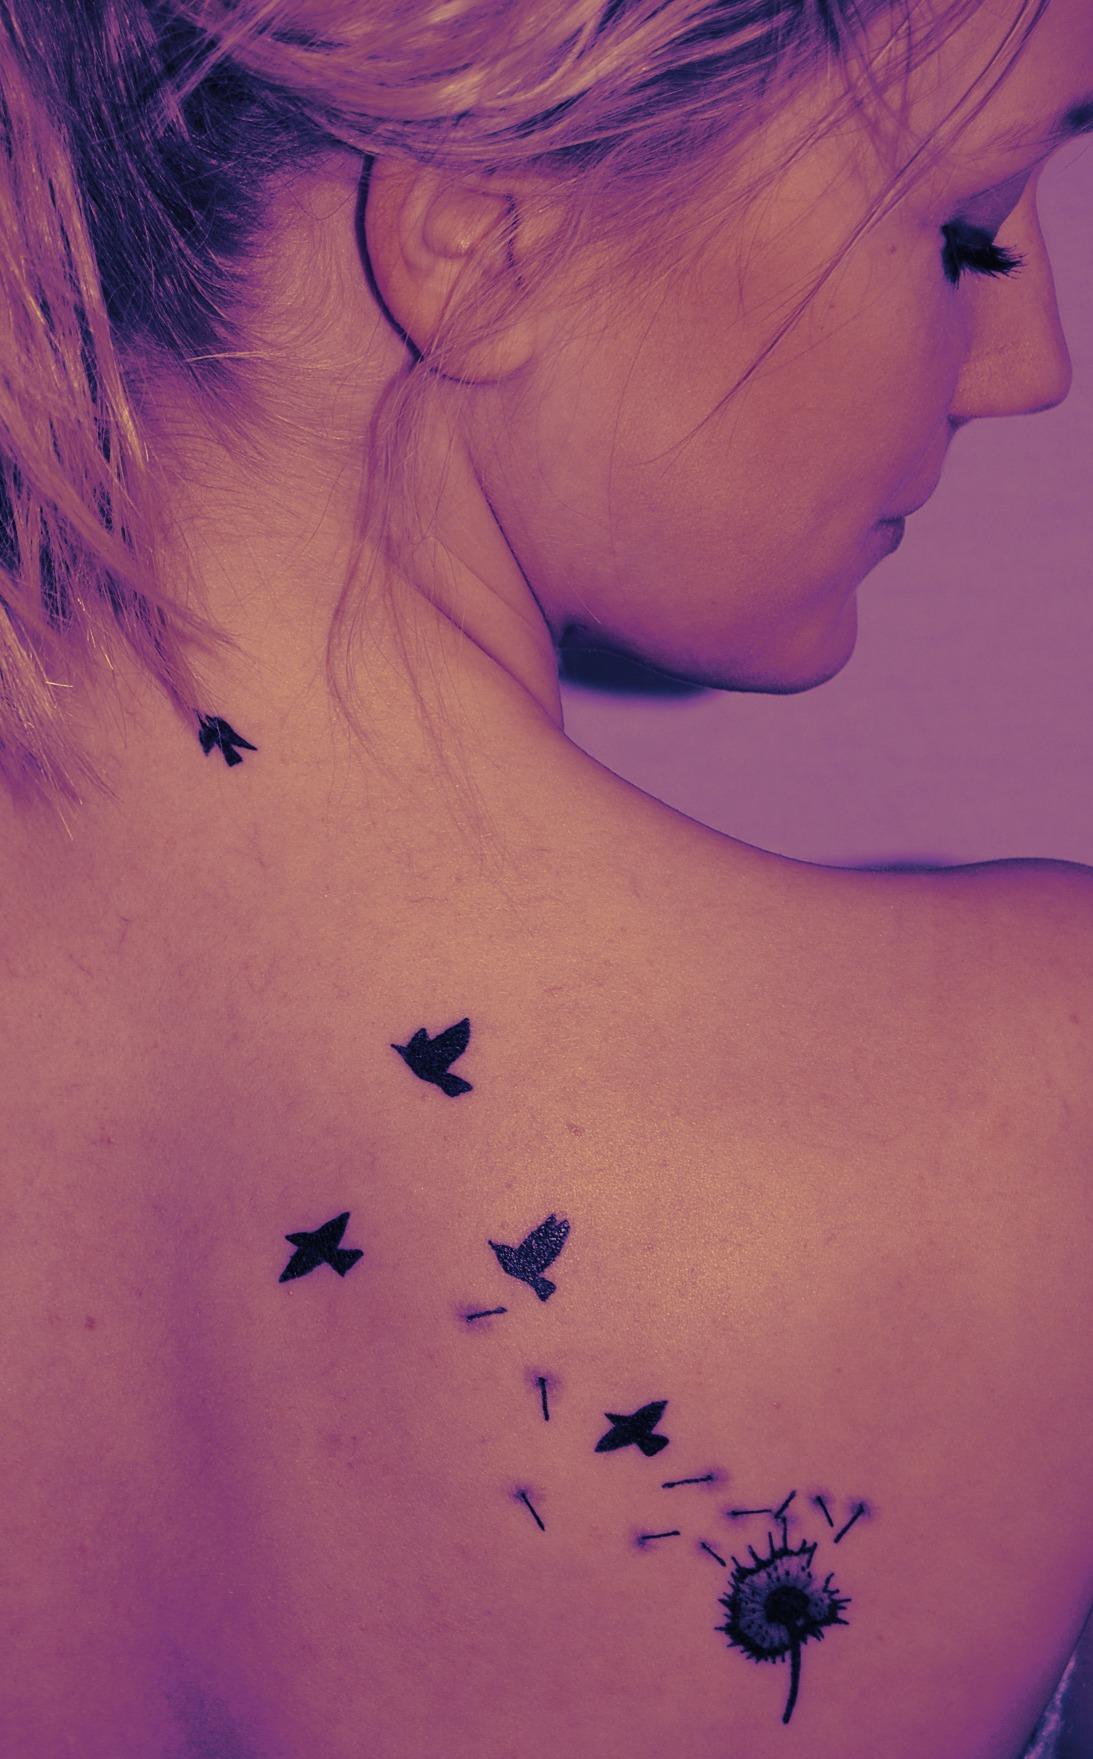 Dandelion Puff And Flying Dandelion Bird Tattoo On Side